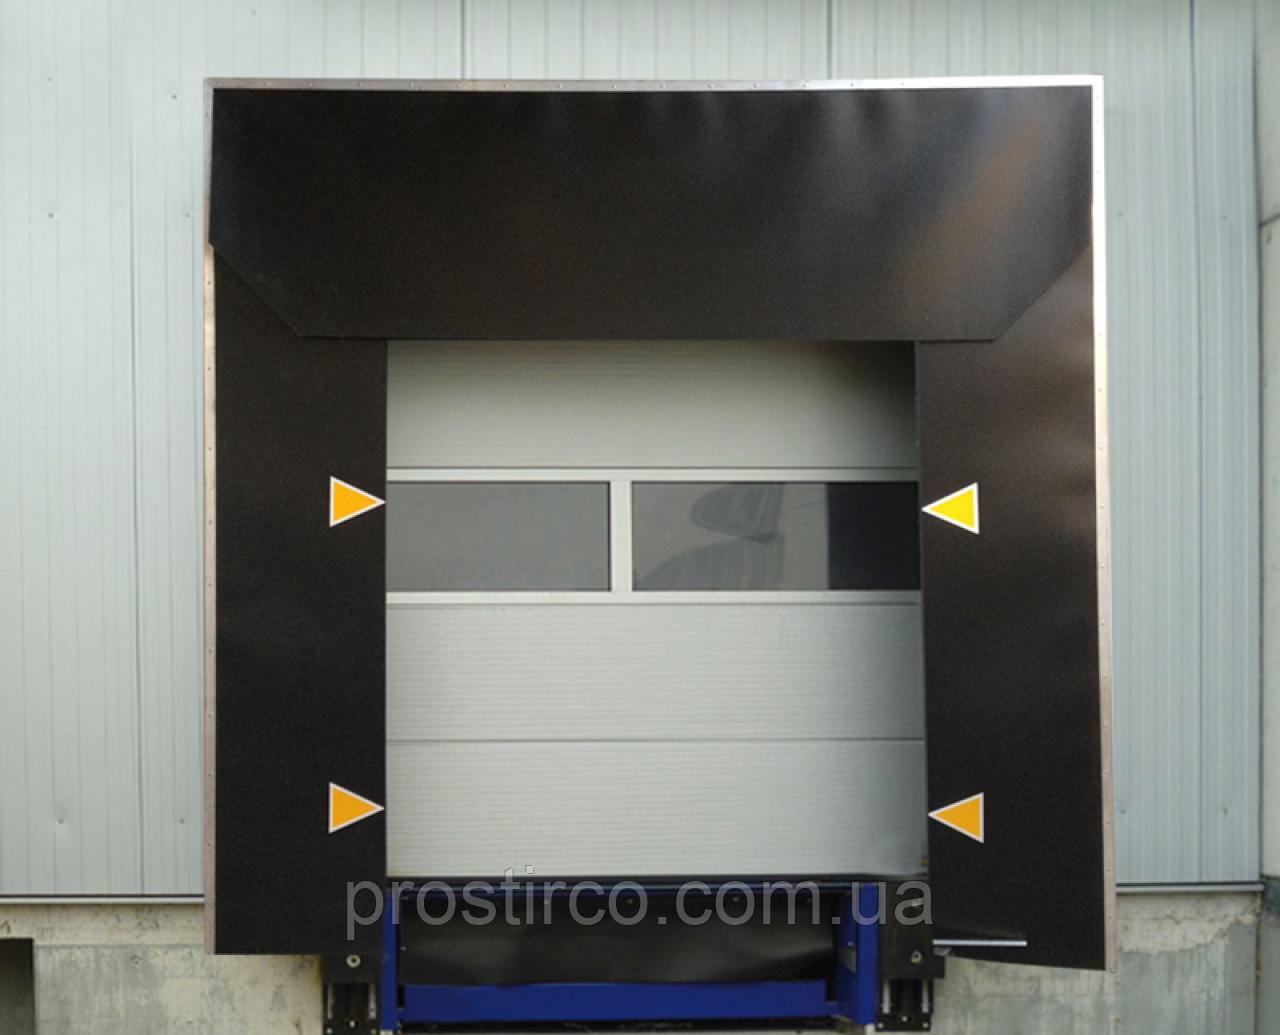 VALMEX® industrial door seal 7812